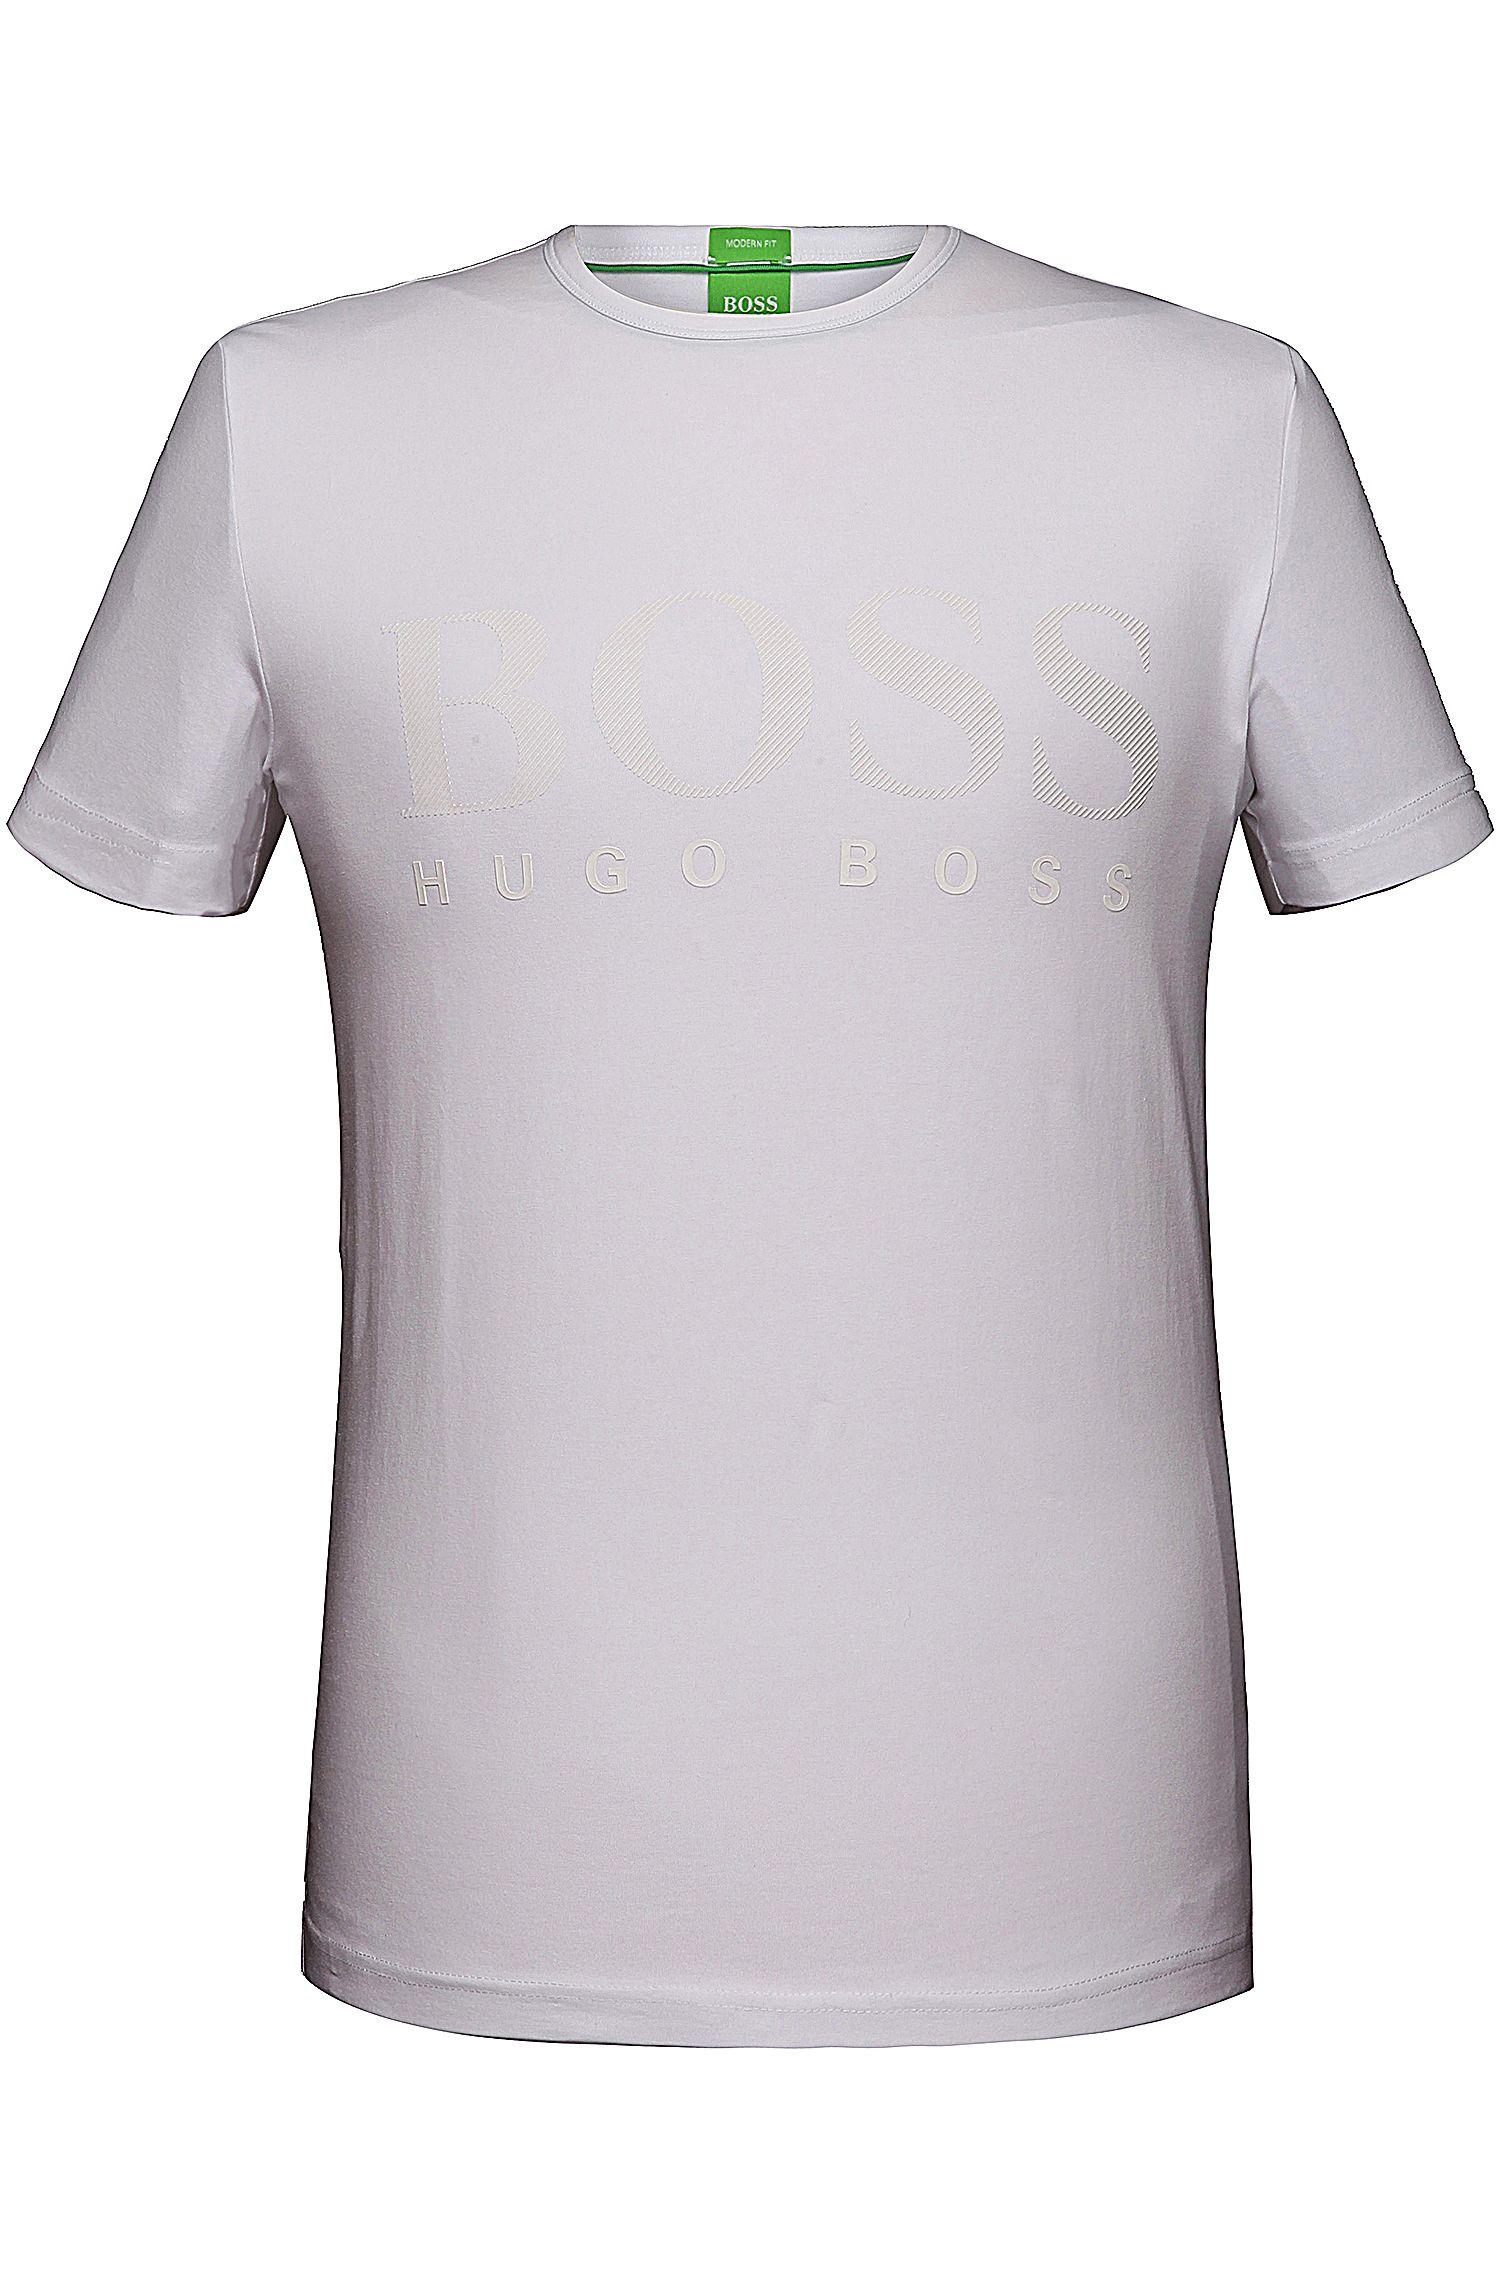 T-shirt 'Tee US' in misto cotone-elastan